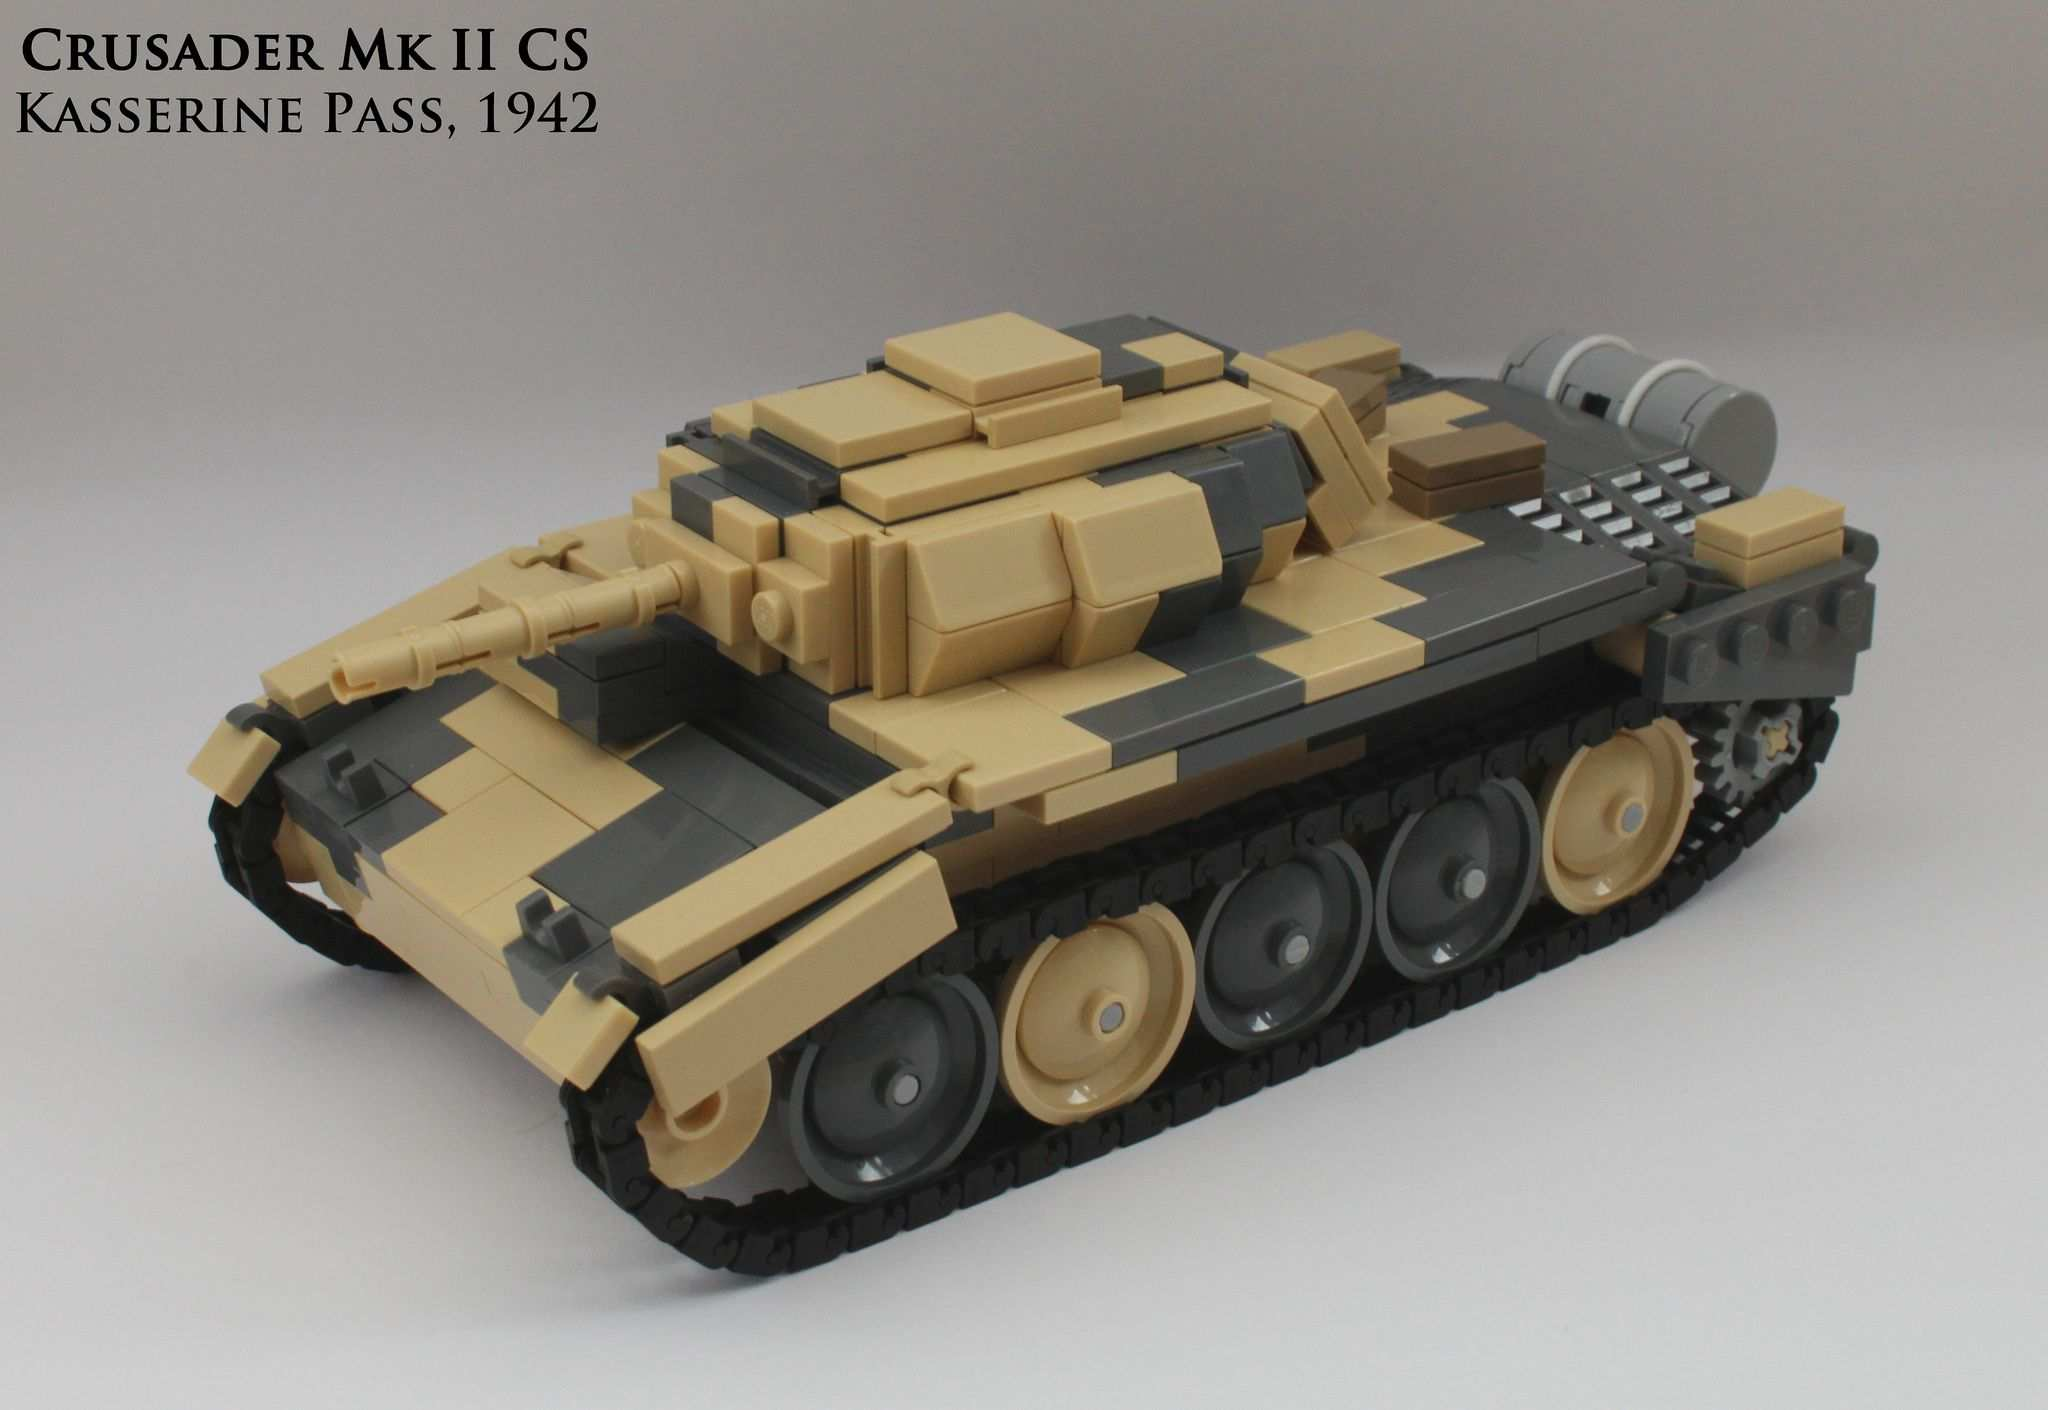 Crusader Mk Ii Cs Lego Military Lego Army Cool Lego Creations